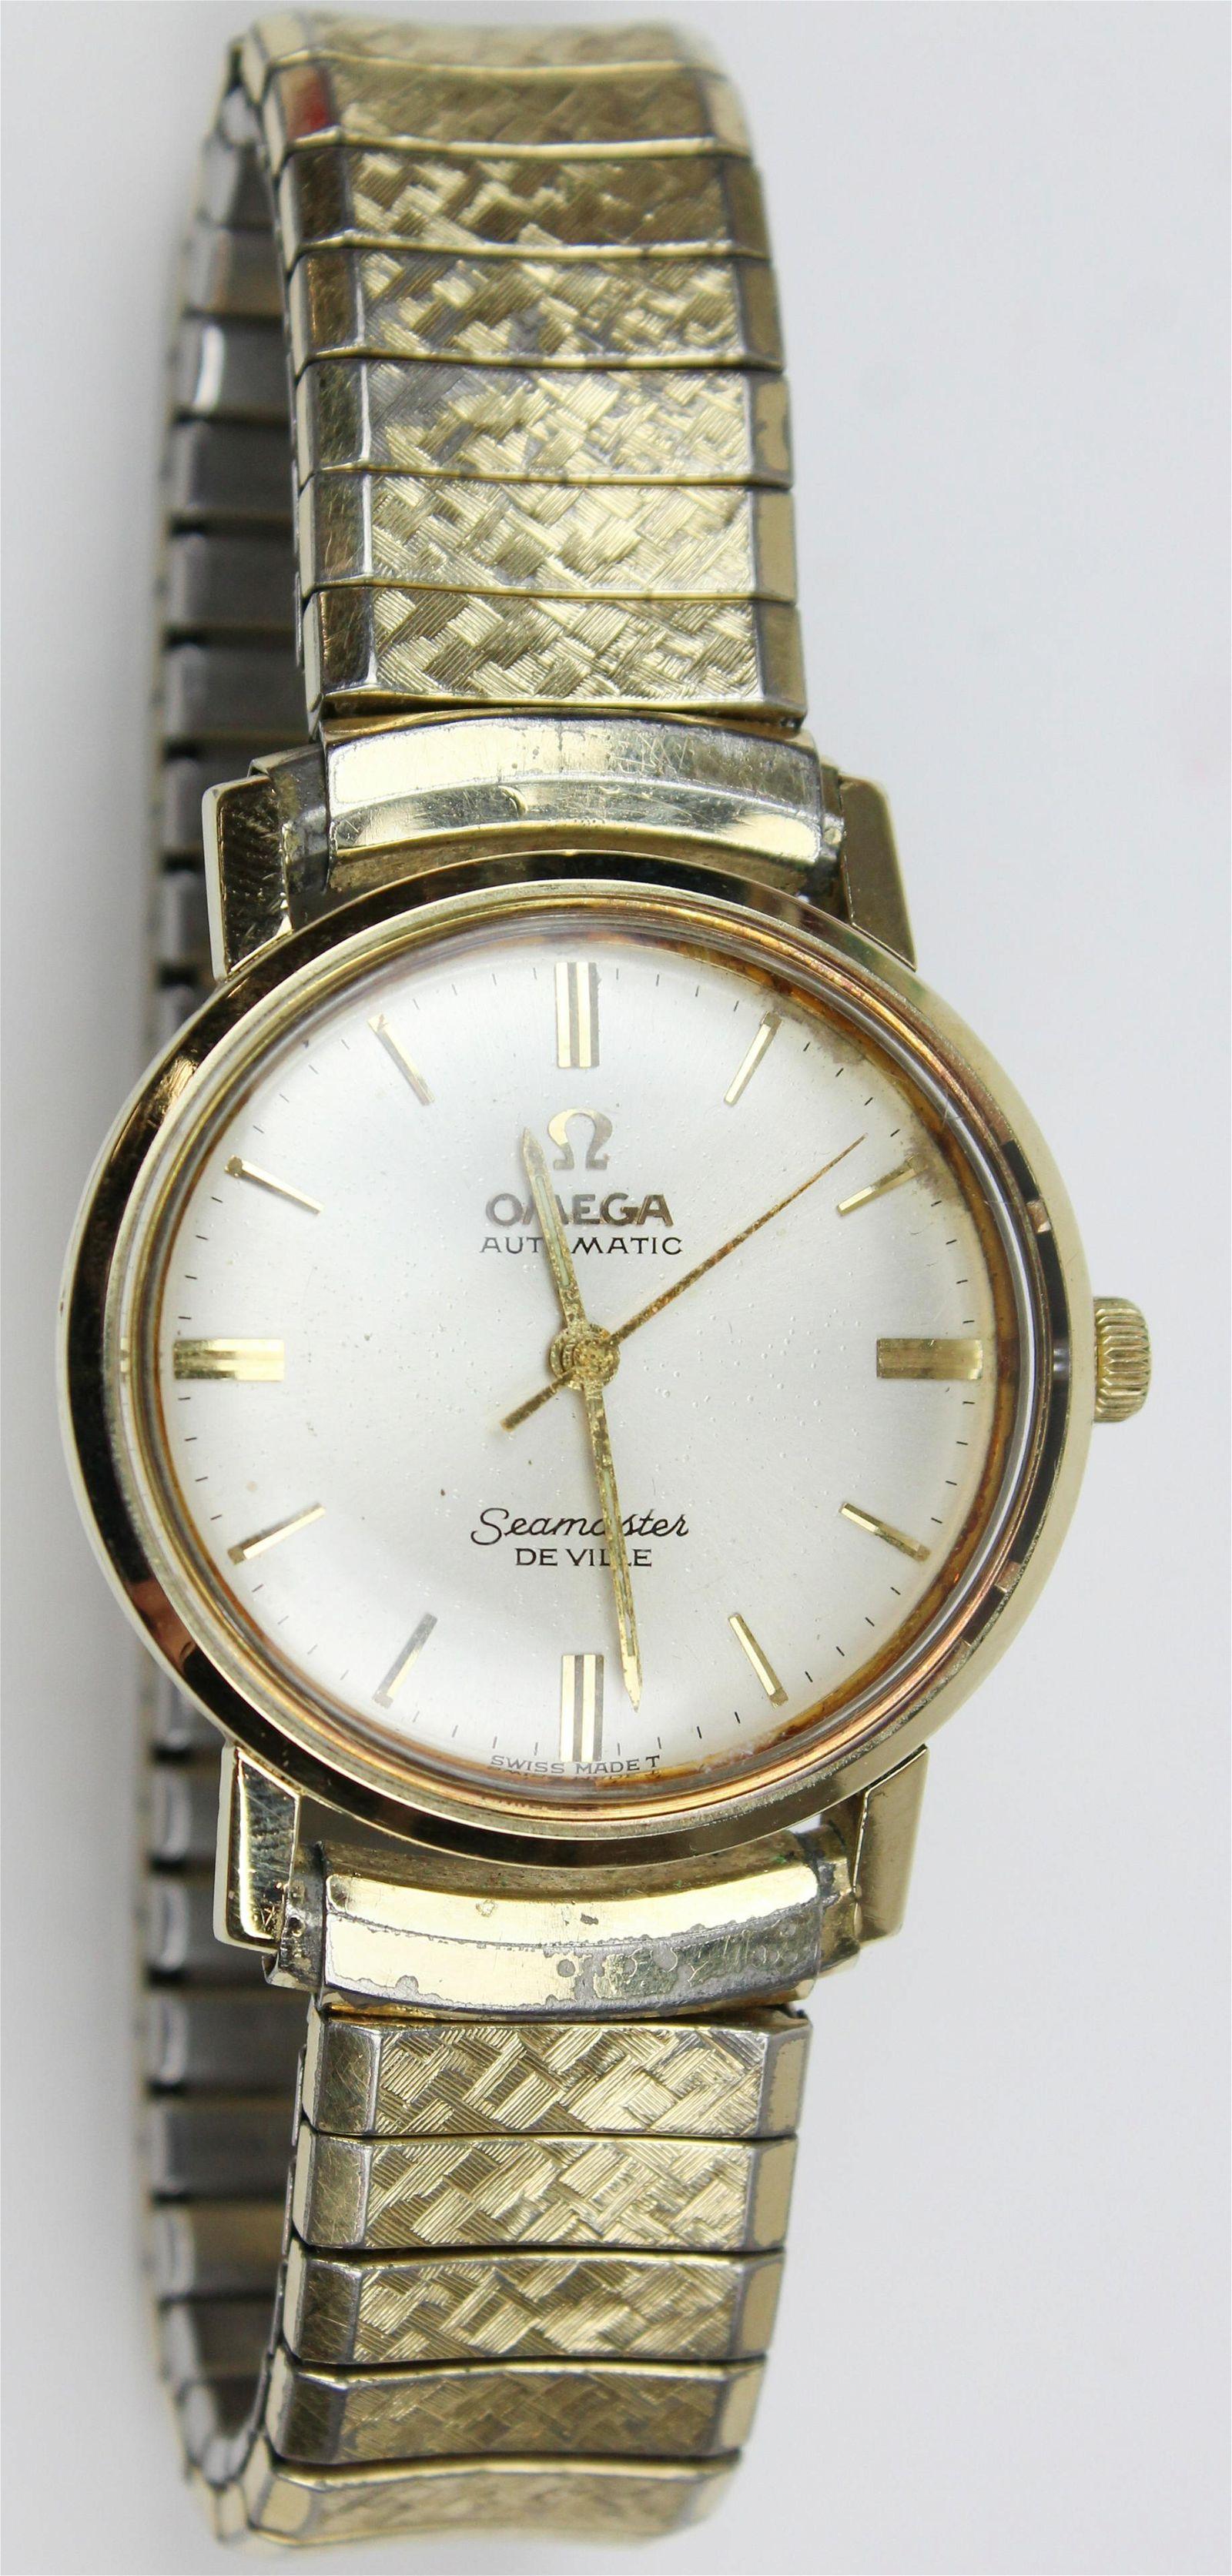 Omega Seamaster men's wrist watch